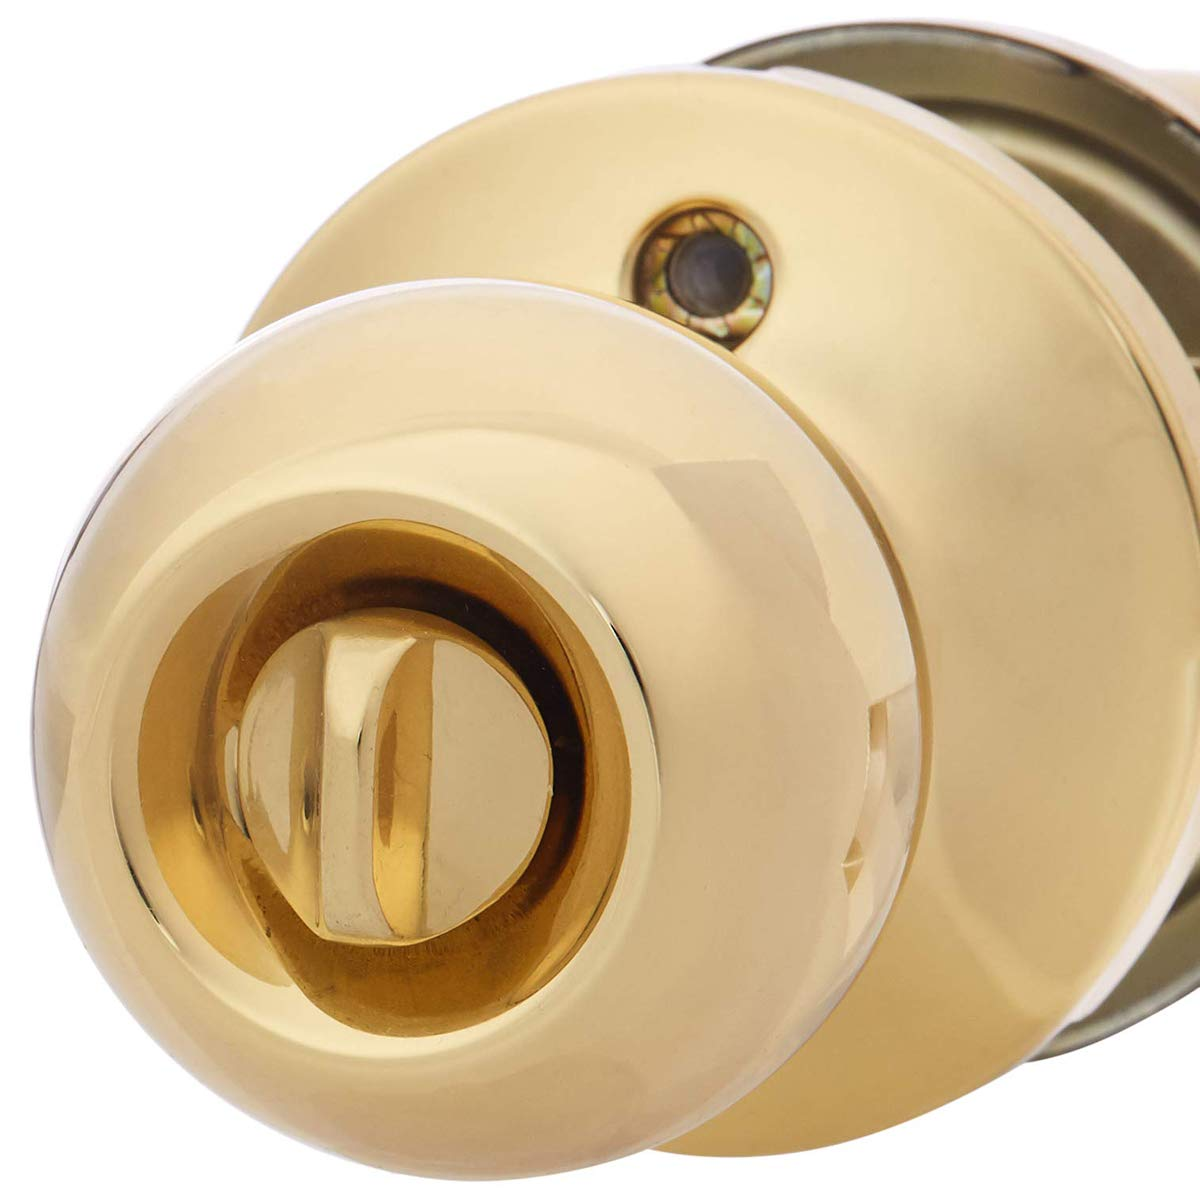 AmazonBasics Entry Door Knob - Standard Ball - Polished Brass by AmazonBasics (Image #2)